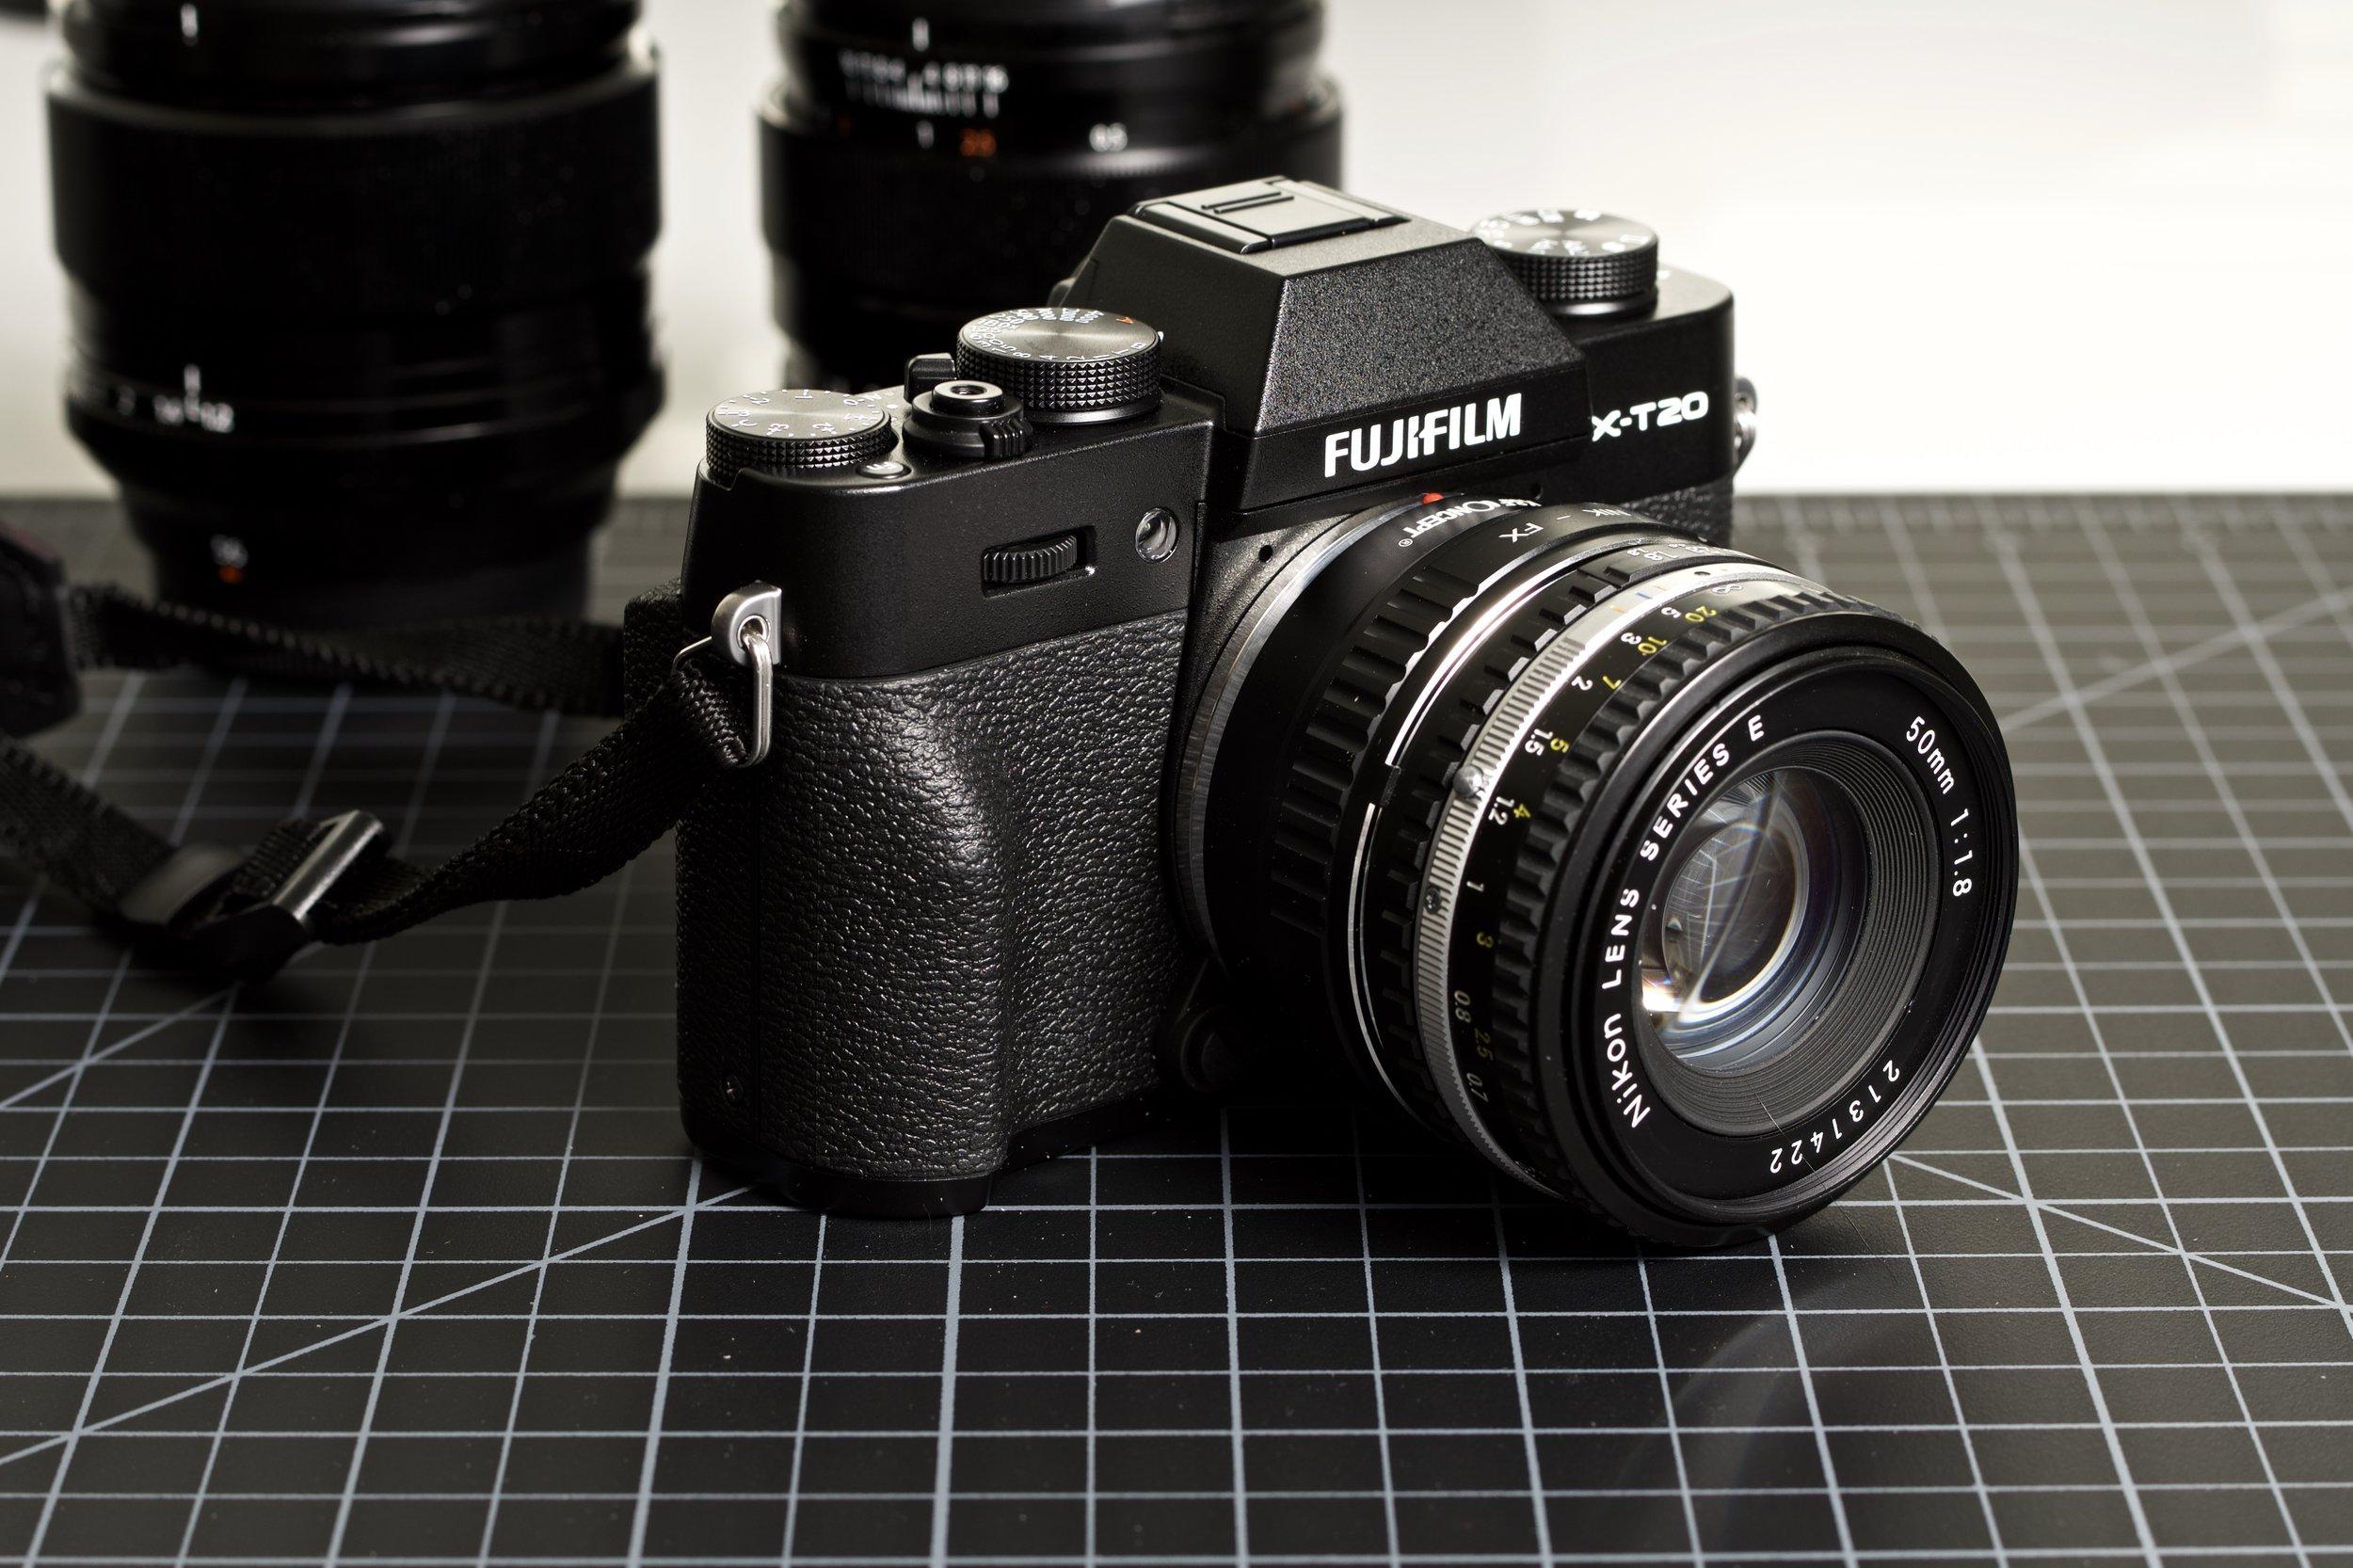 FujiFilm X-T20 with K&F Concept Nikon F to Fuji X mount adapter, Nikkor 50mm ƒ1.8 E-Series